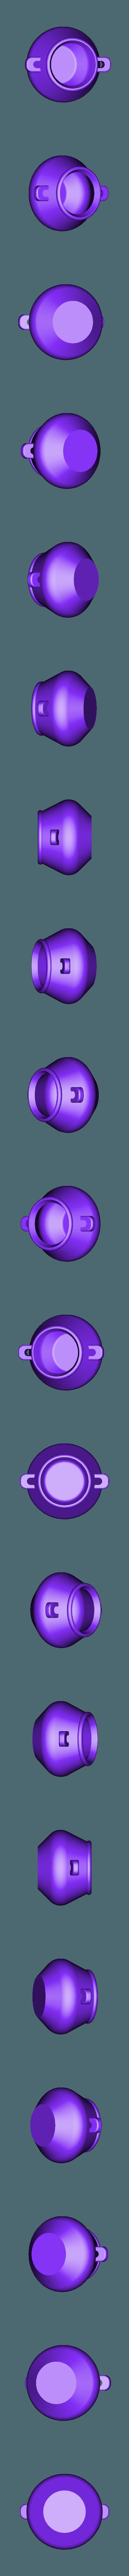 Body.stl Download free STL file Sugar Pot • 3D printable template, Piggie